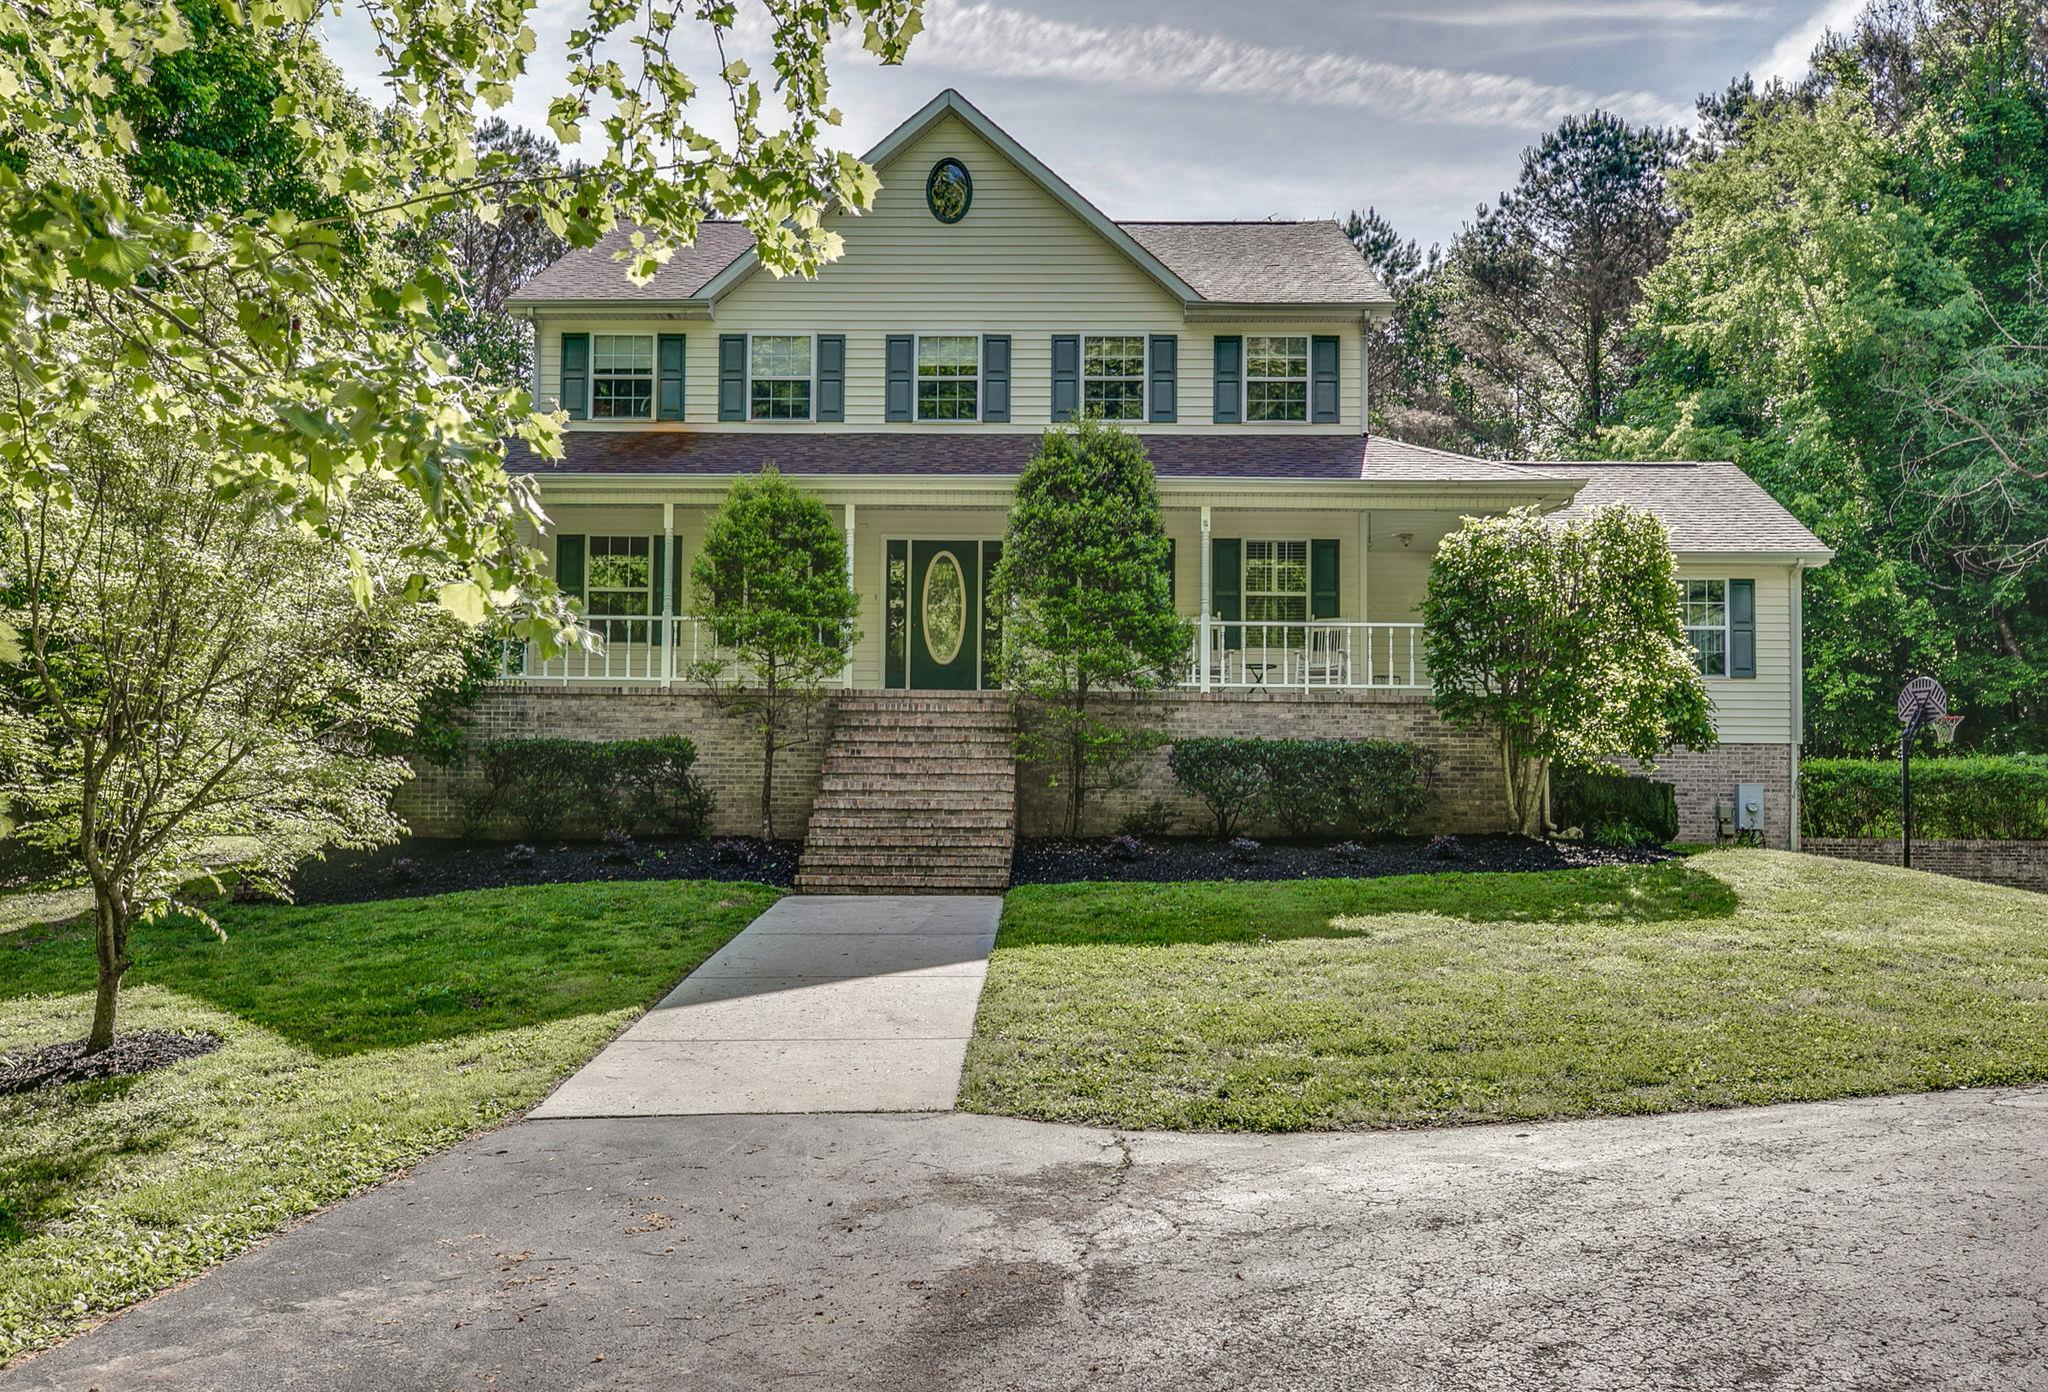 166 Hidden Springs Rd, Tullahoma, TN 37388 - Tullahoma, TN real estate listing